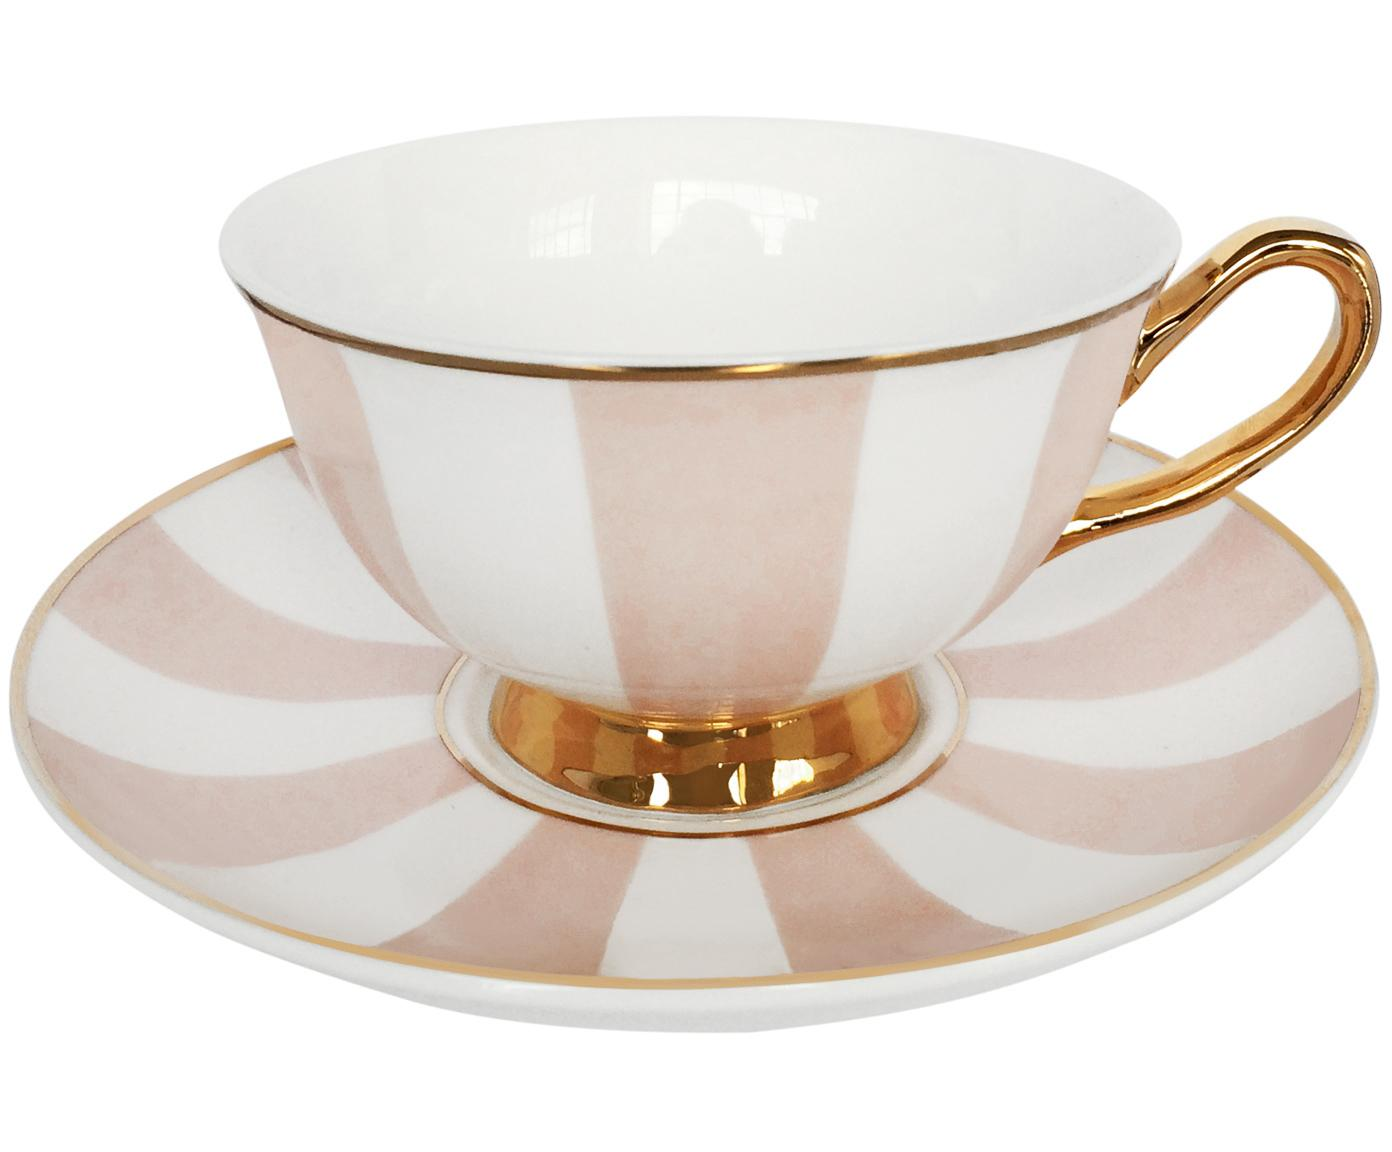 Tazza da tè Stripy, 2 pz., Porcellana cinese dorata, Rosa, bianco<br>Bordo e manico: dorato, Ø 15 x Alt. 6 cm